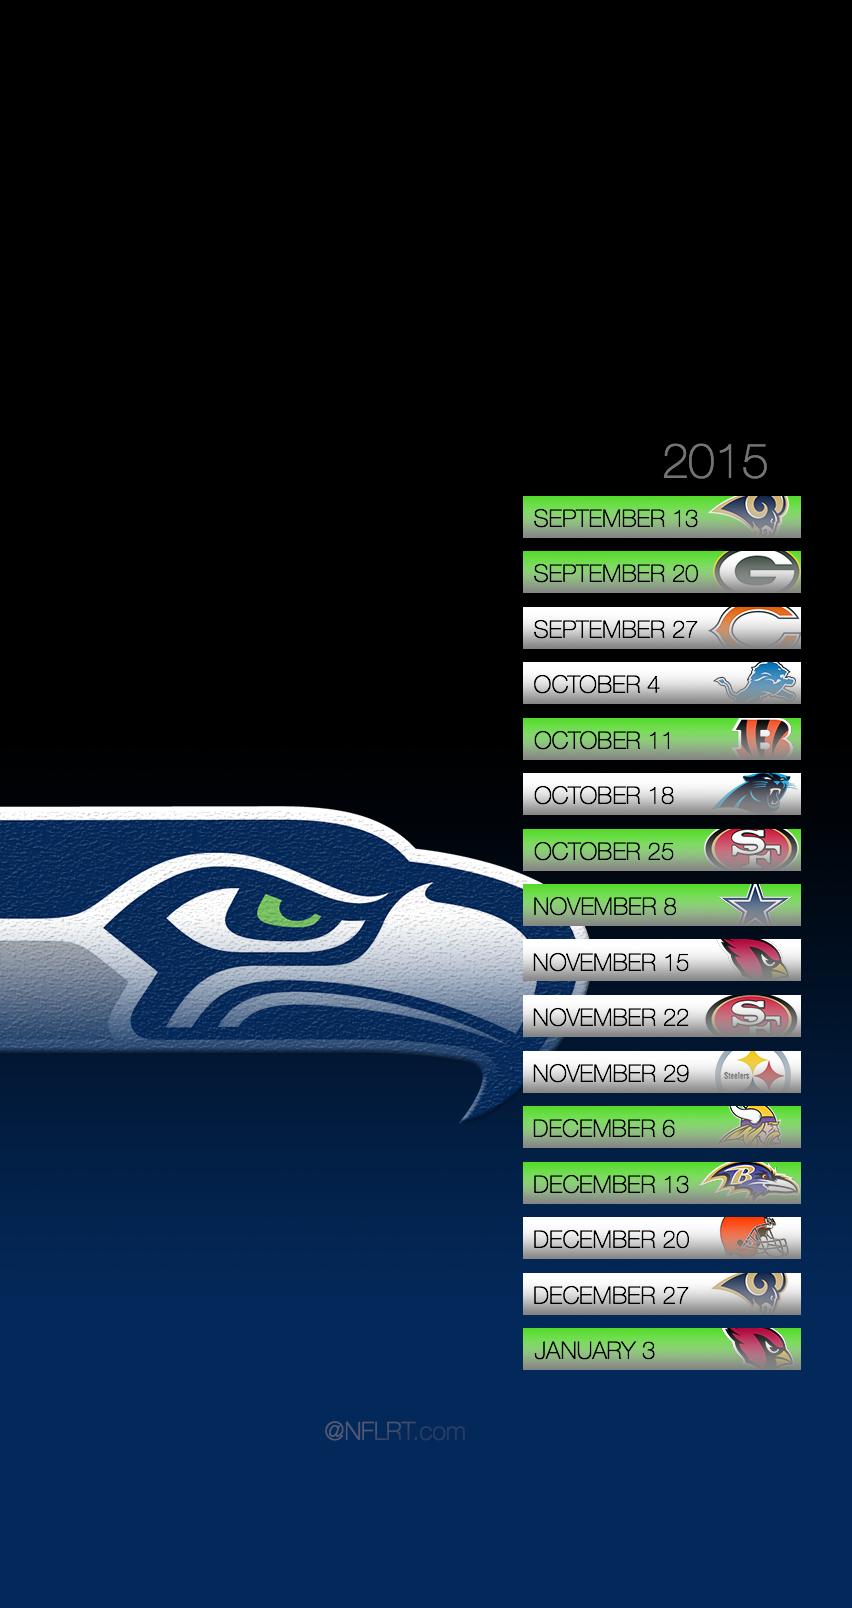 seahawks schedule 2015 by nflrt com http nflrt com 2015 nfl schedule 852x1608